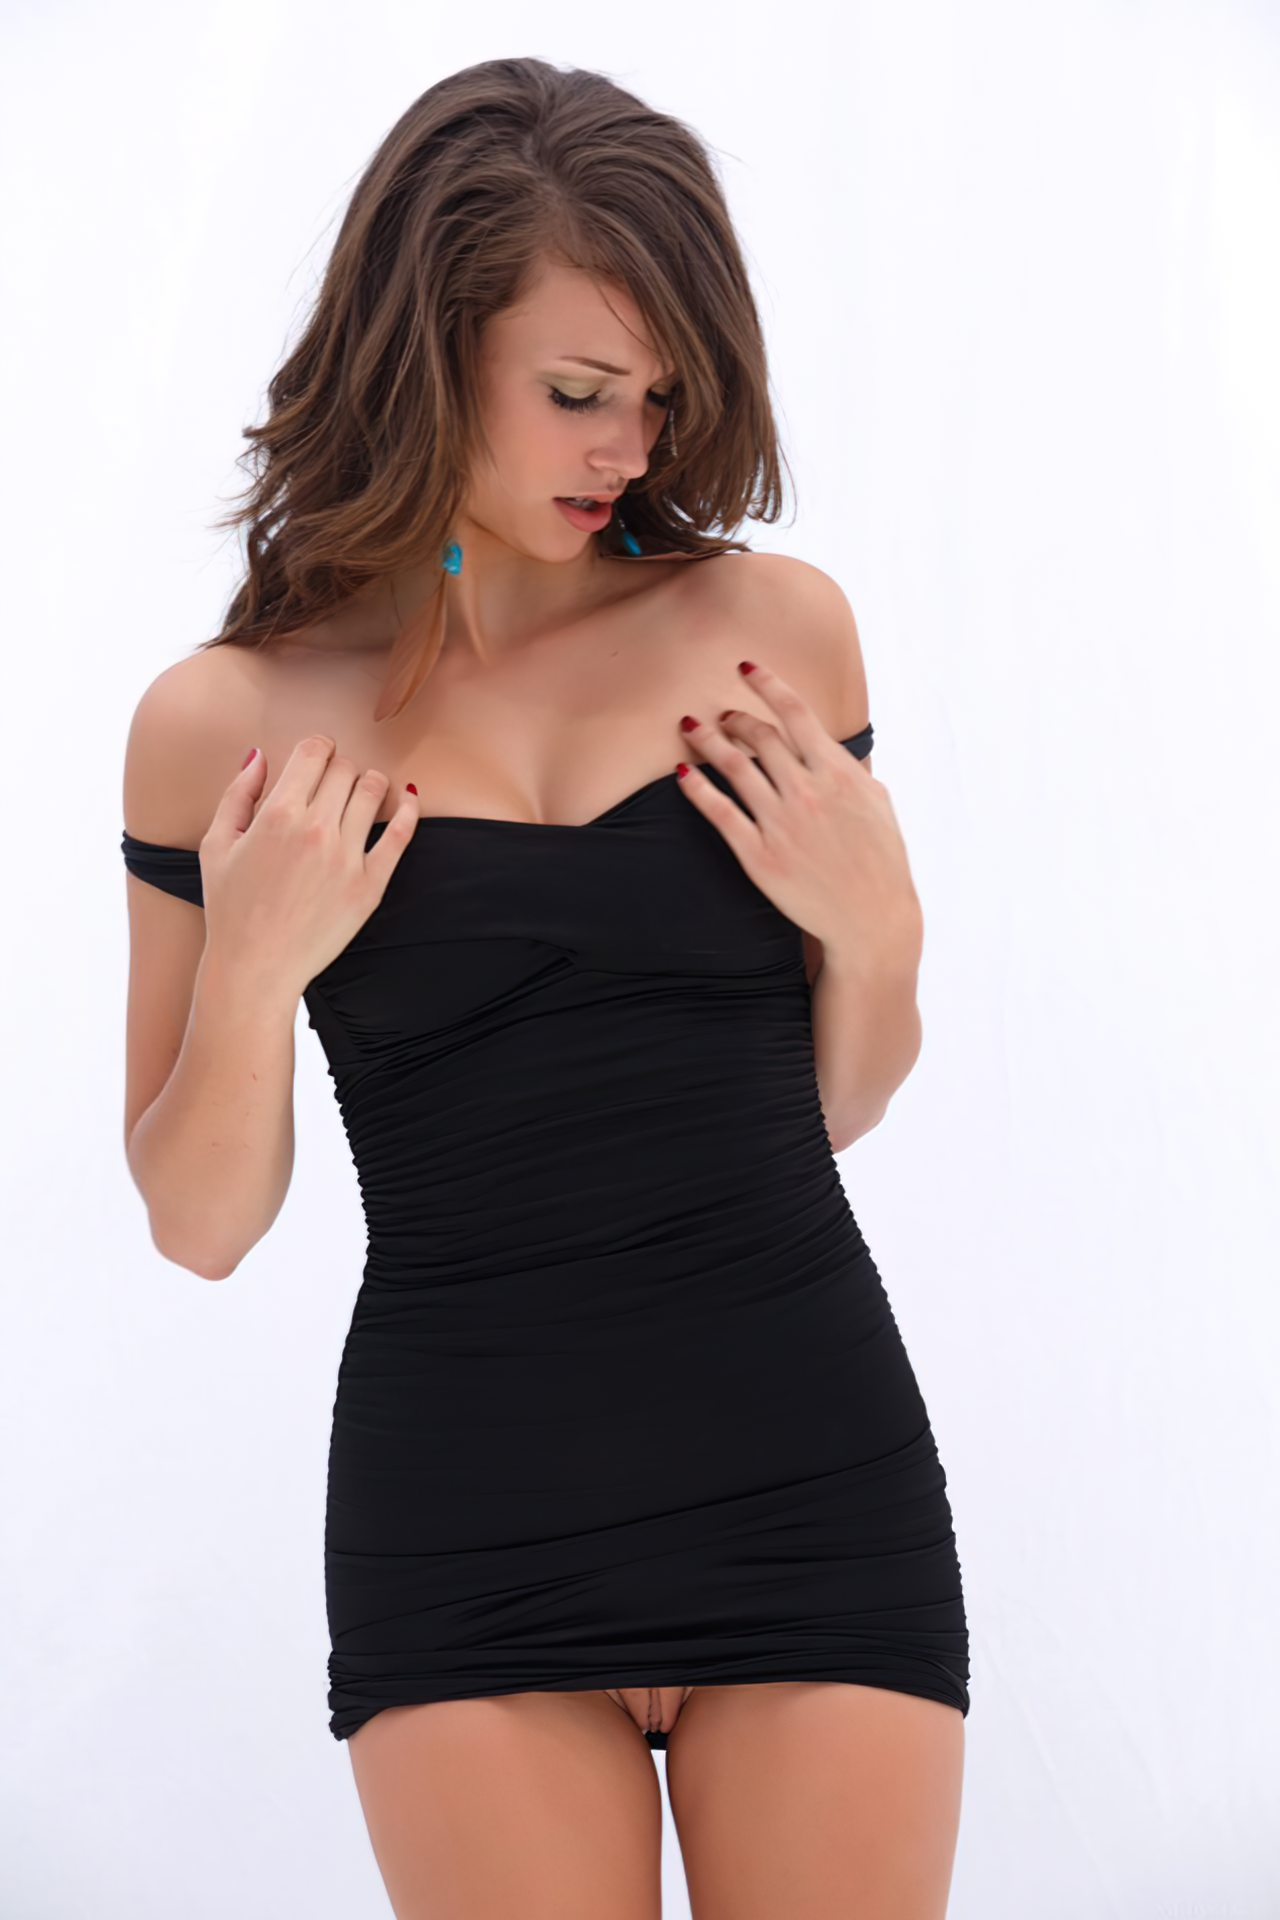 Melena Morgan (4)